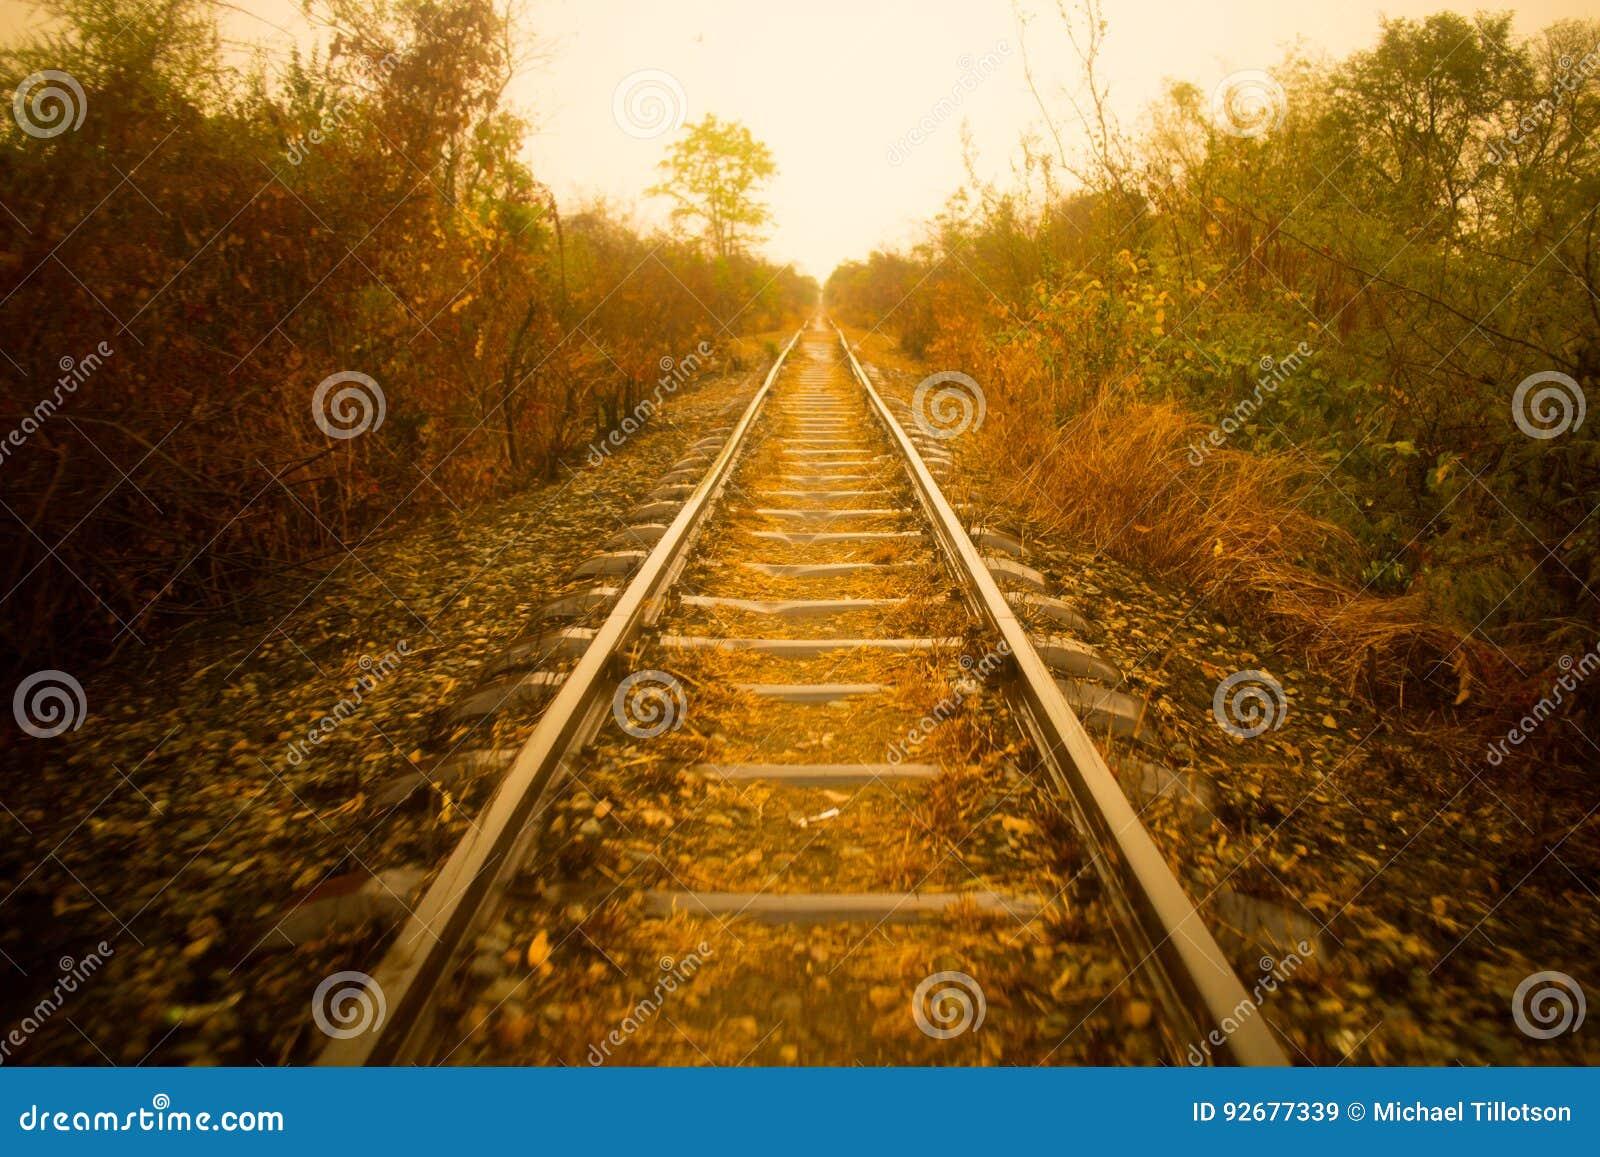 Old Abandoned Railroad Train Tracks